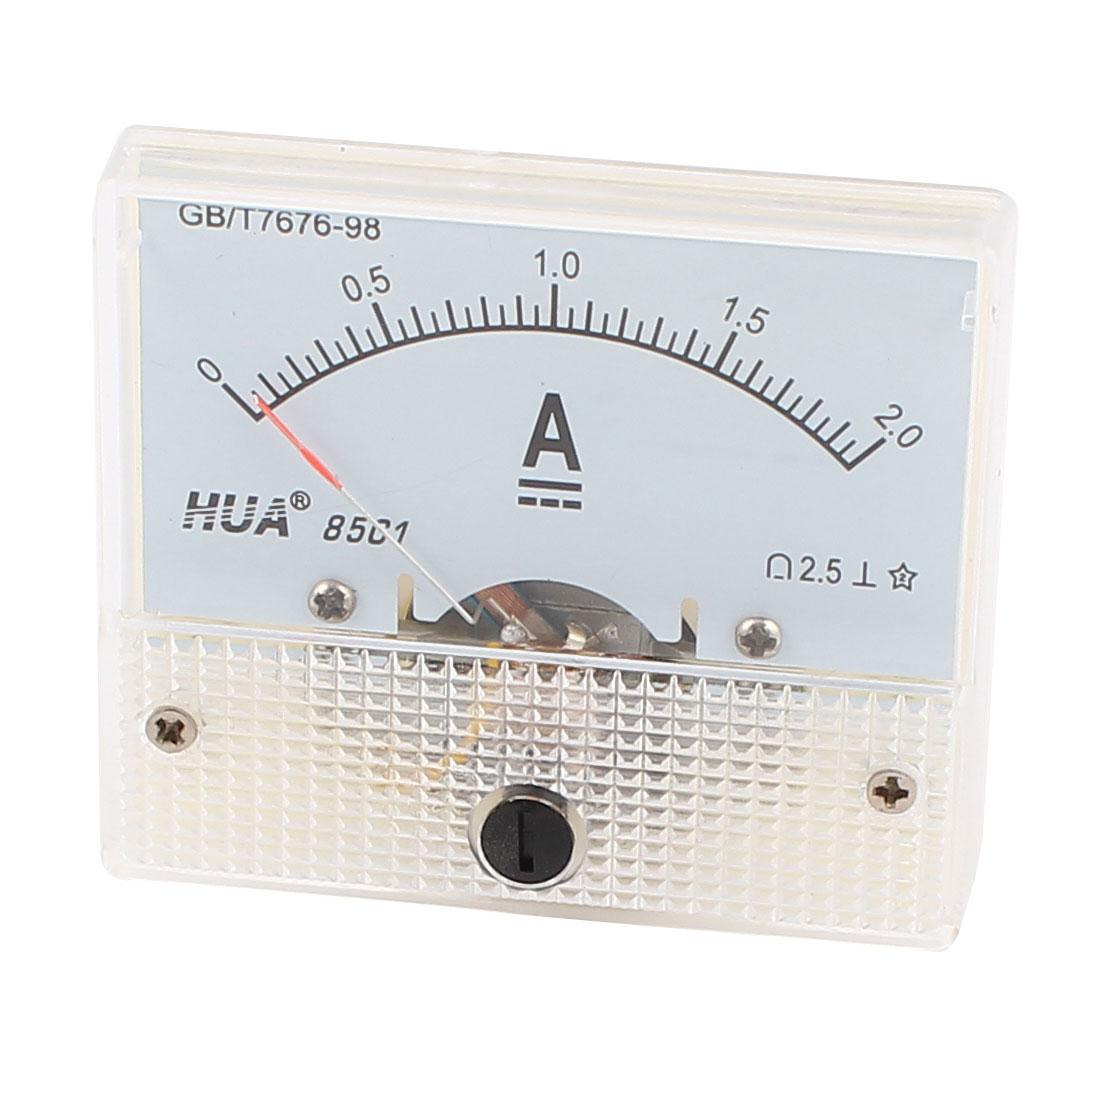 85C1 Panel DC Current Ampere Meter Analog Ammeter 0-2A